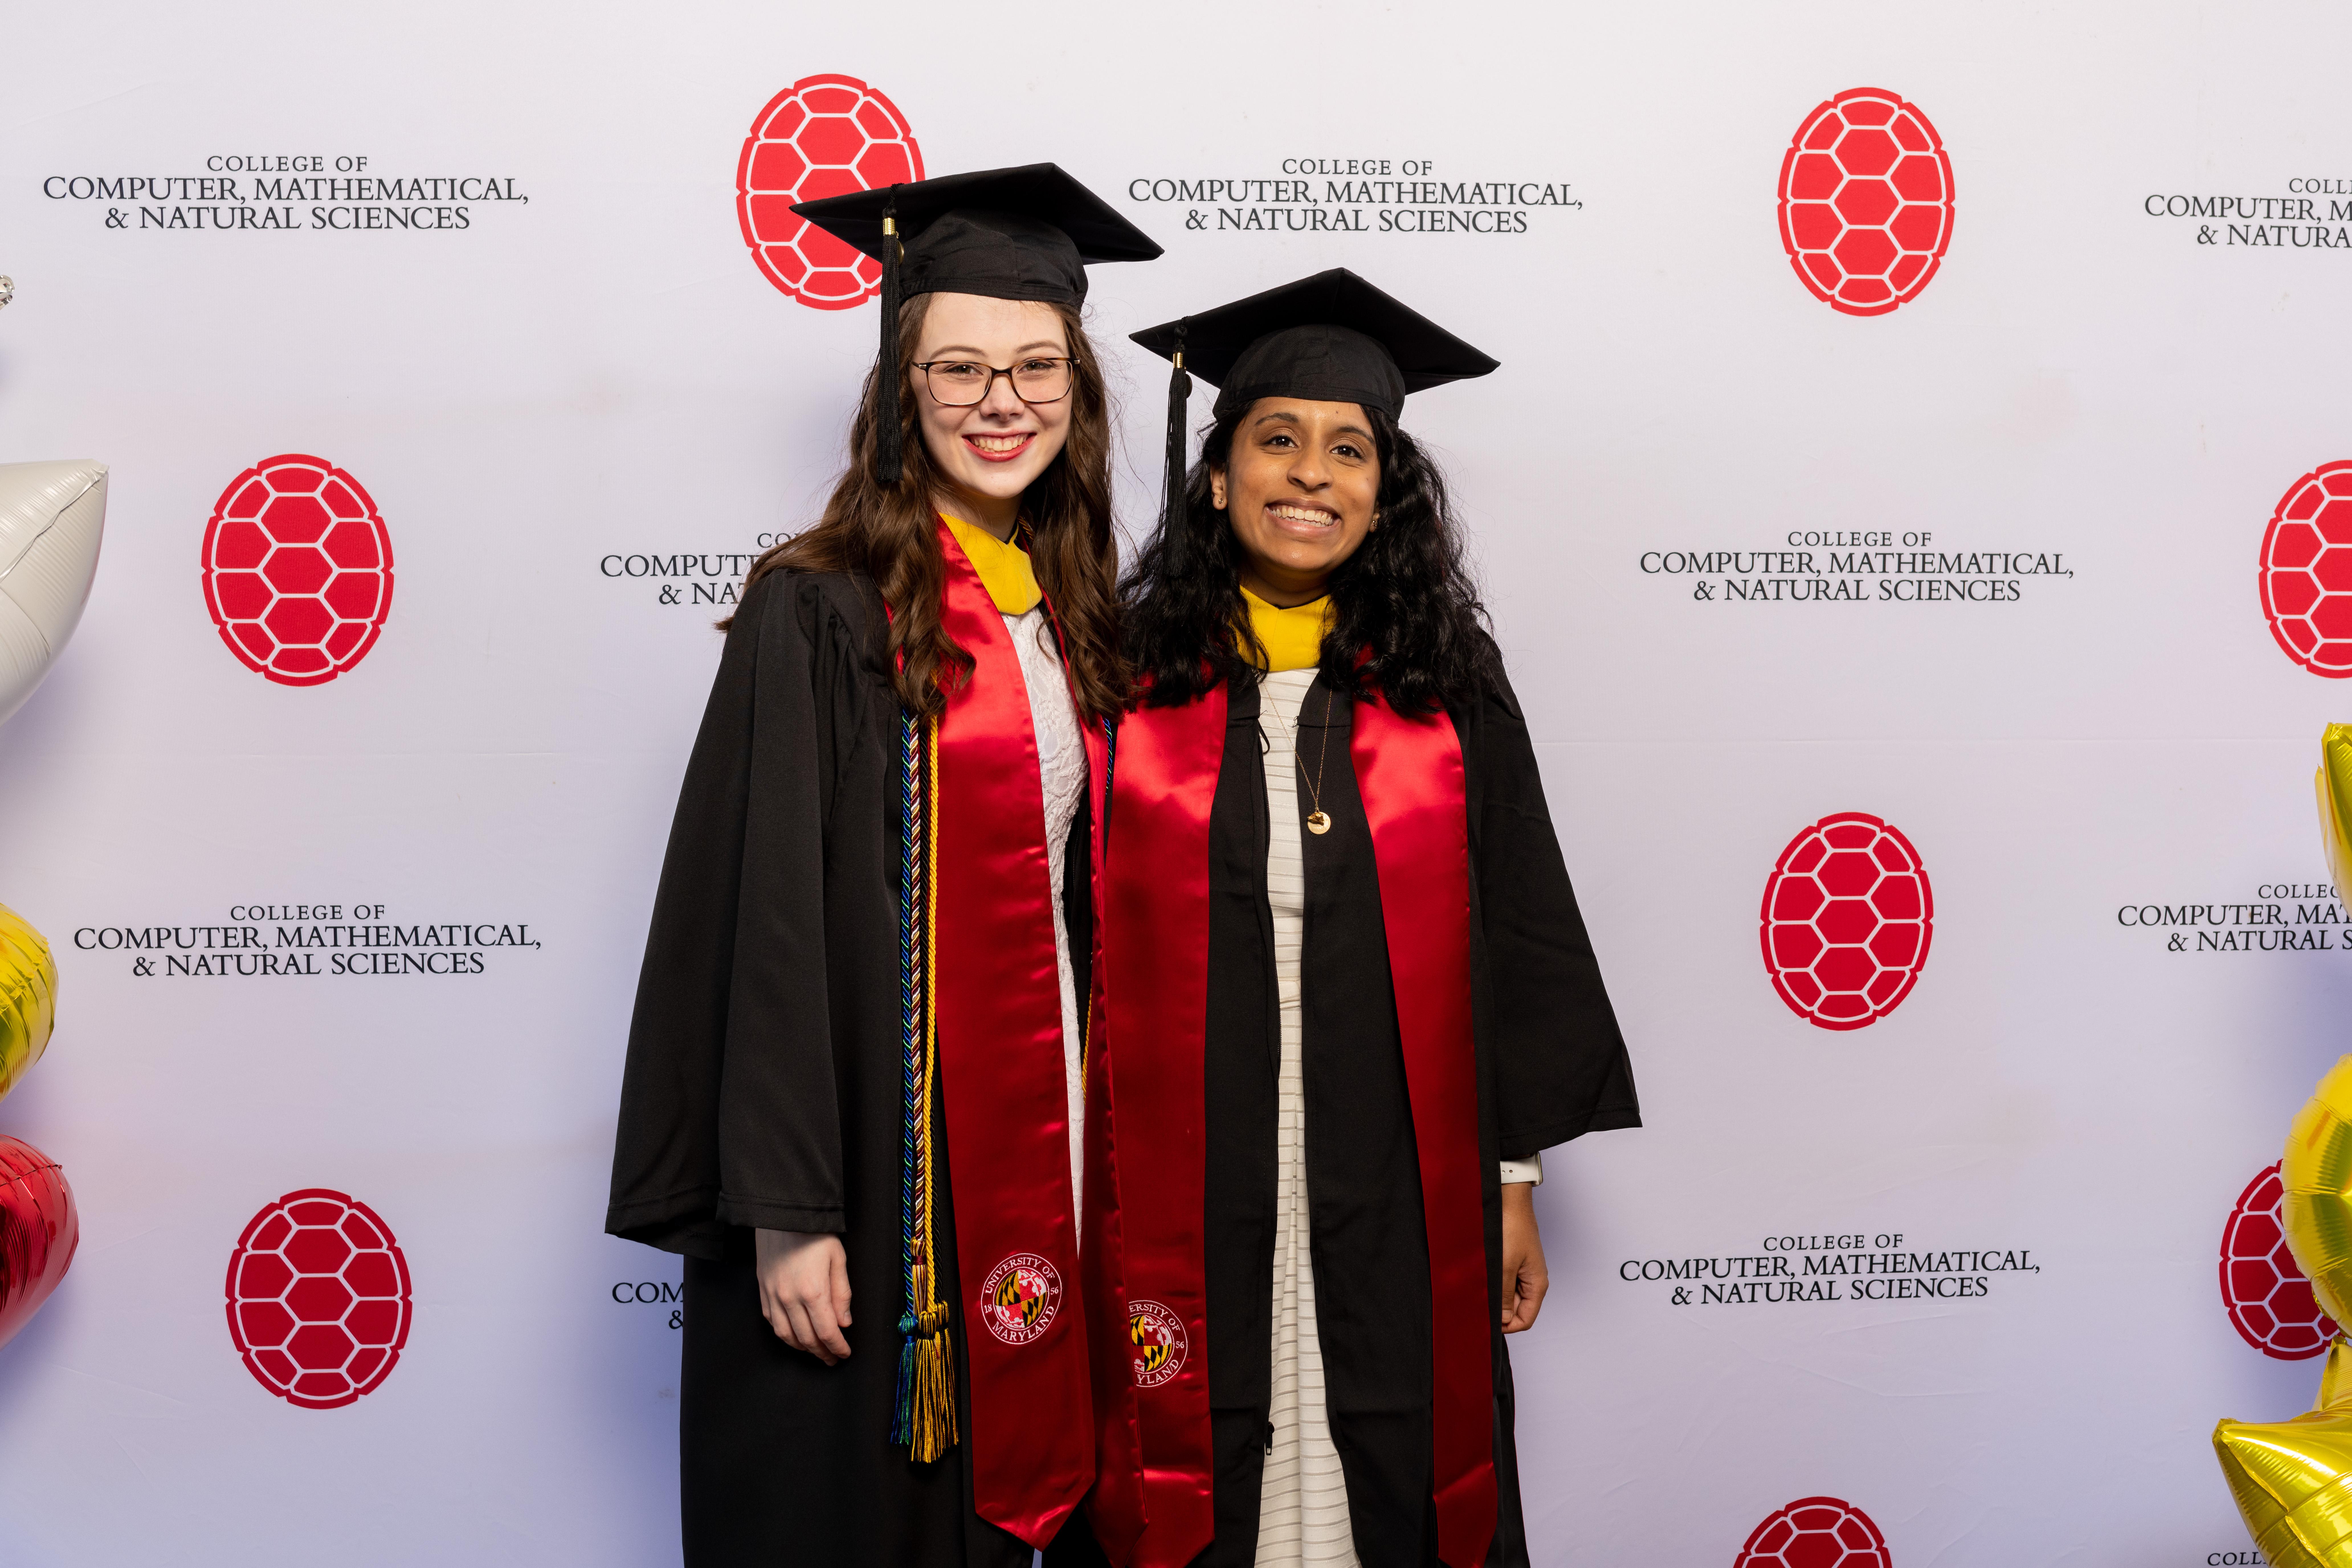 Descriptive image for Congratulations to Computer Science Spring 2021 Graduates